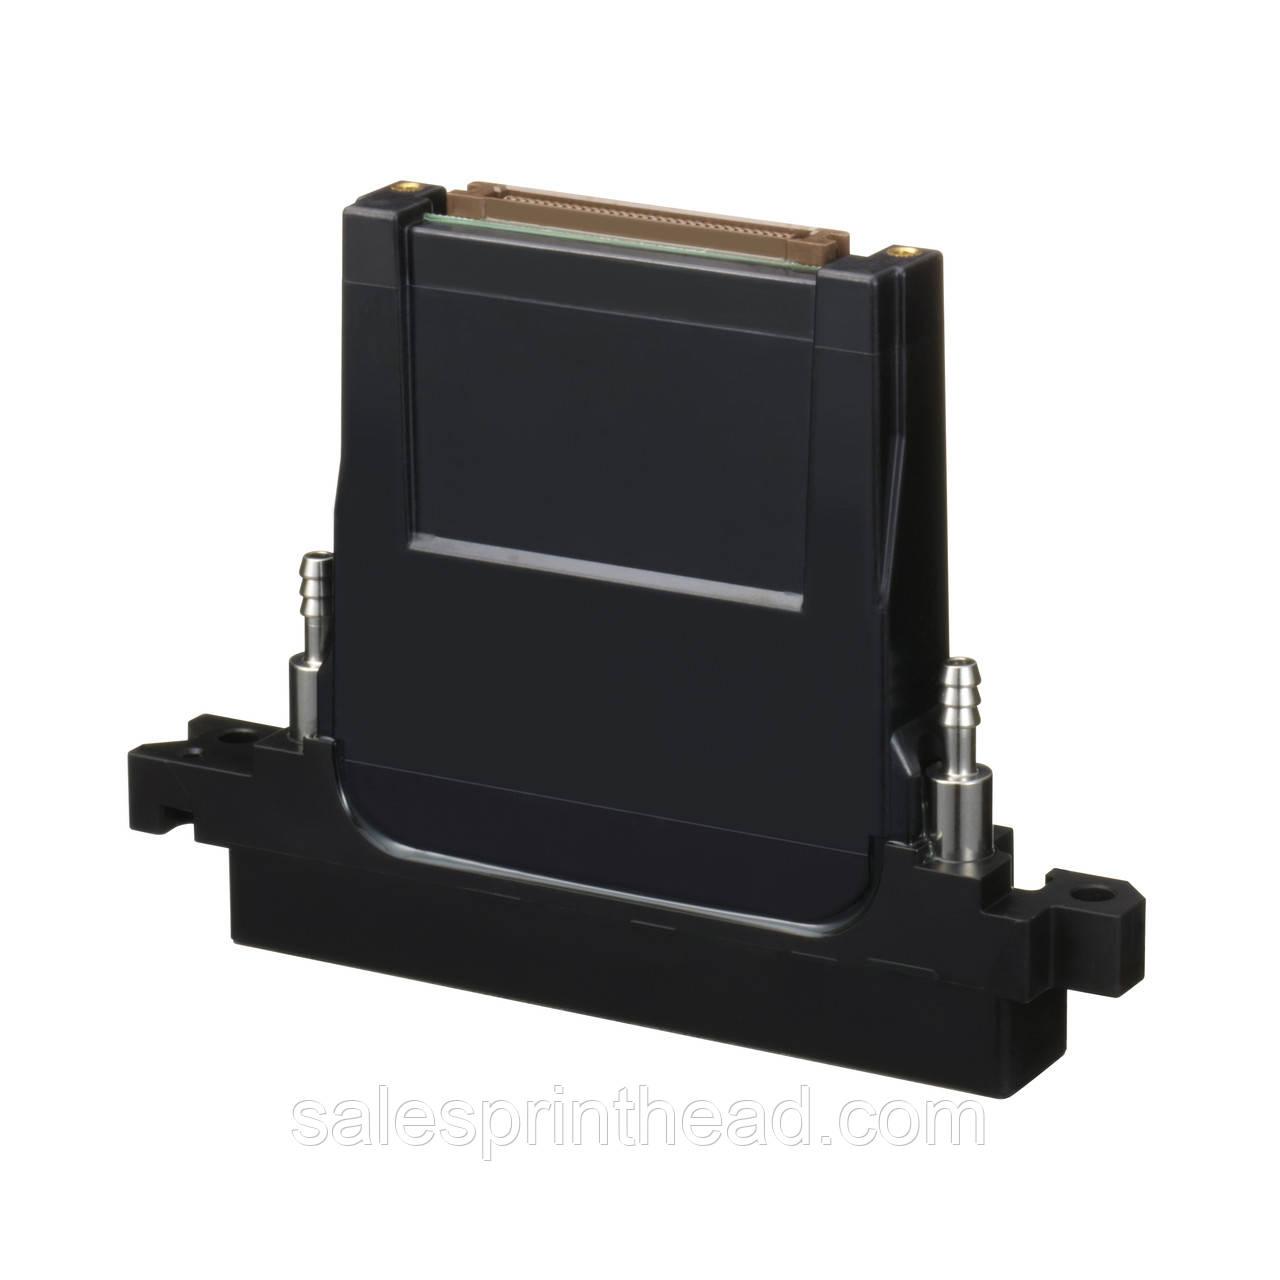 KM1024i Series High-speed inkjet printhead (KM1024i - высокоскоростная печатная головка)